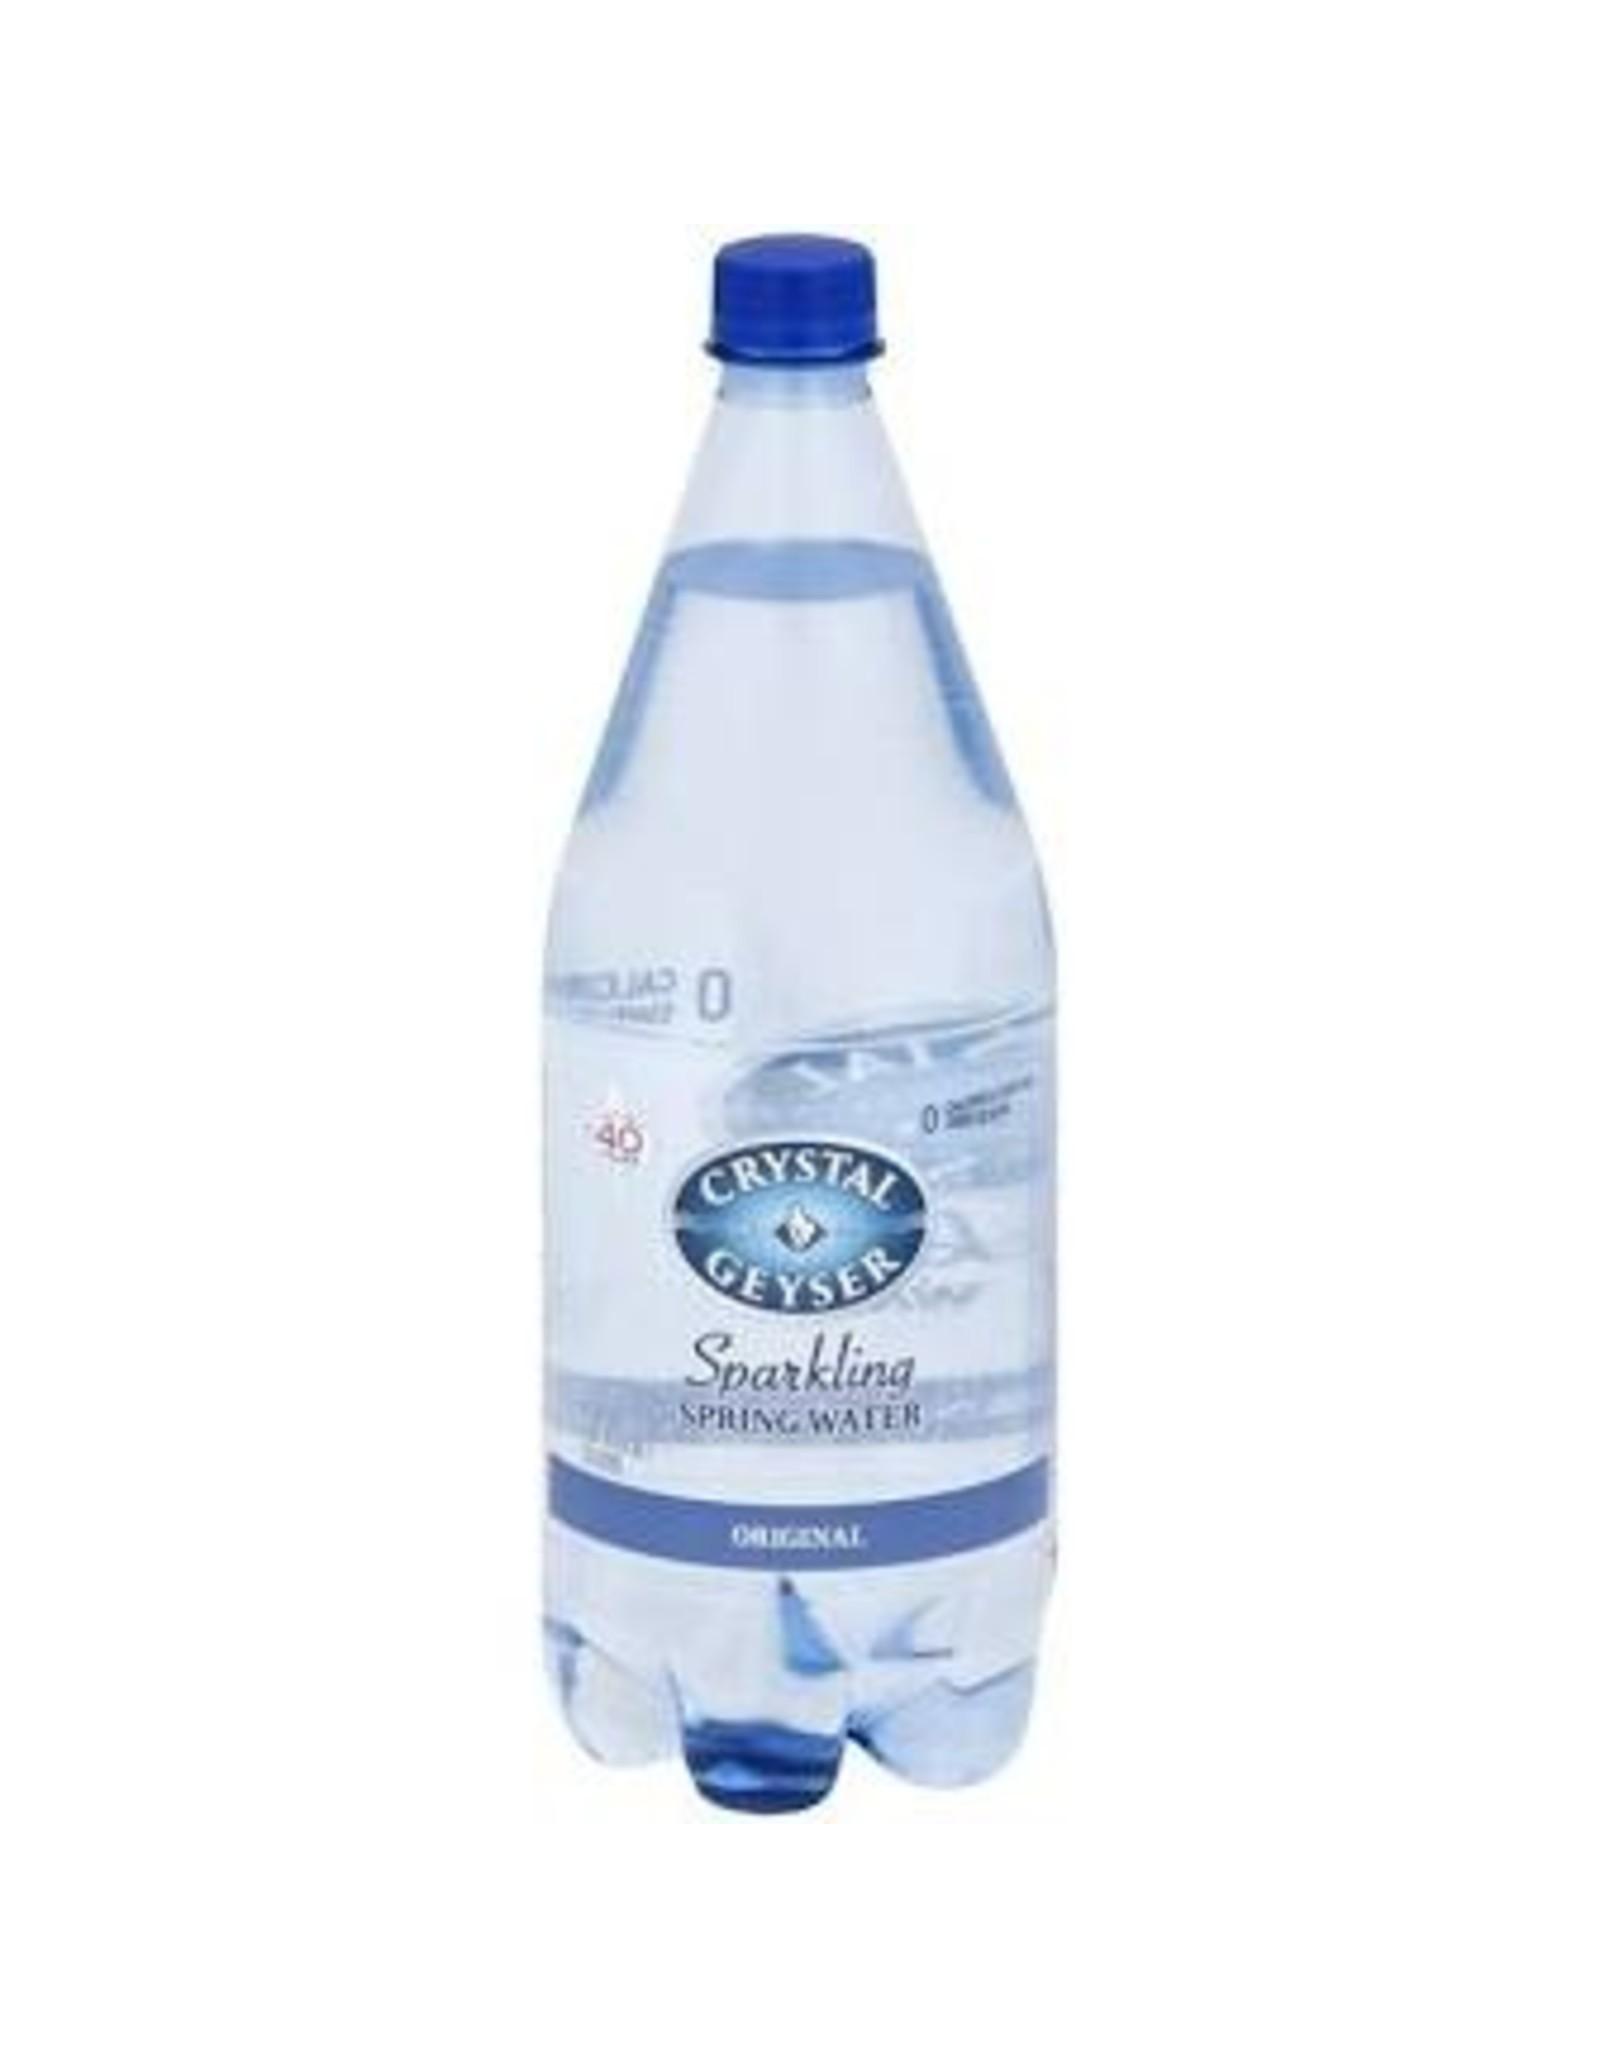 Crystal Geyser Sparkling Mineral Water